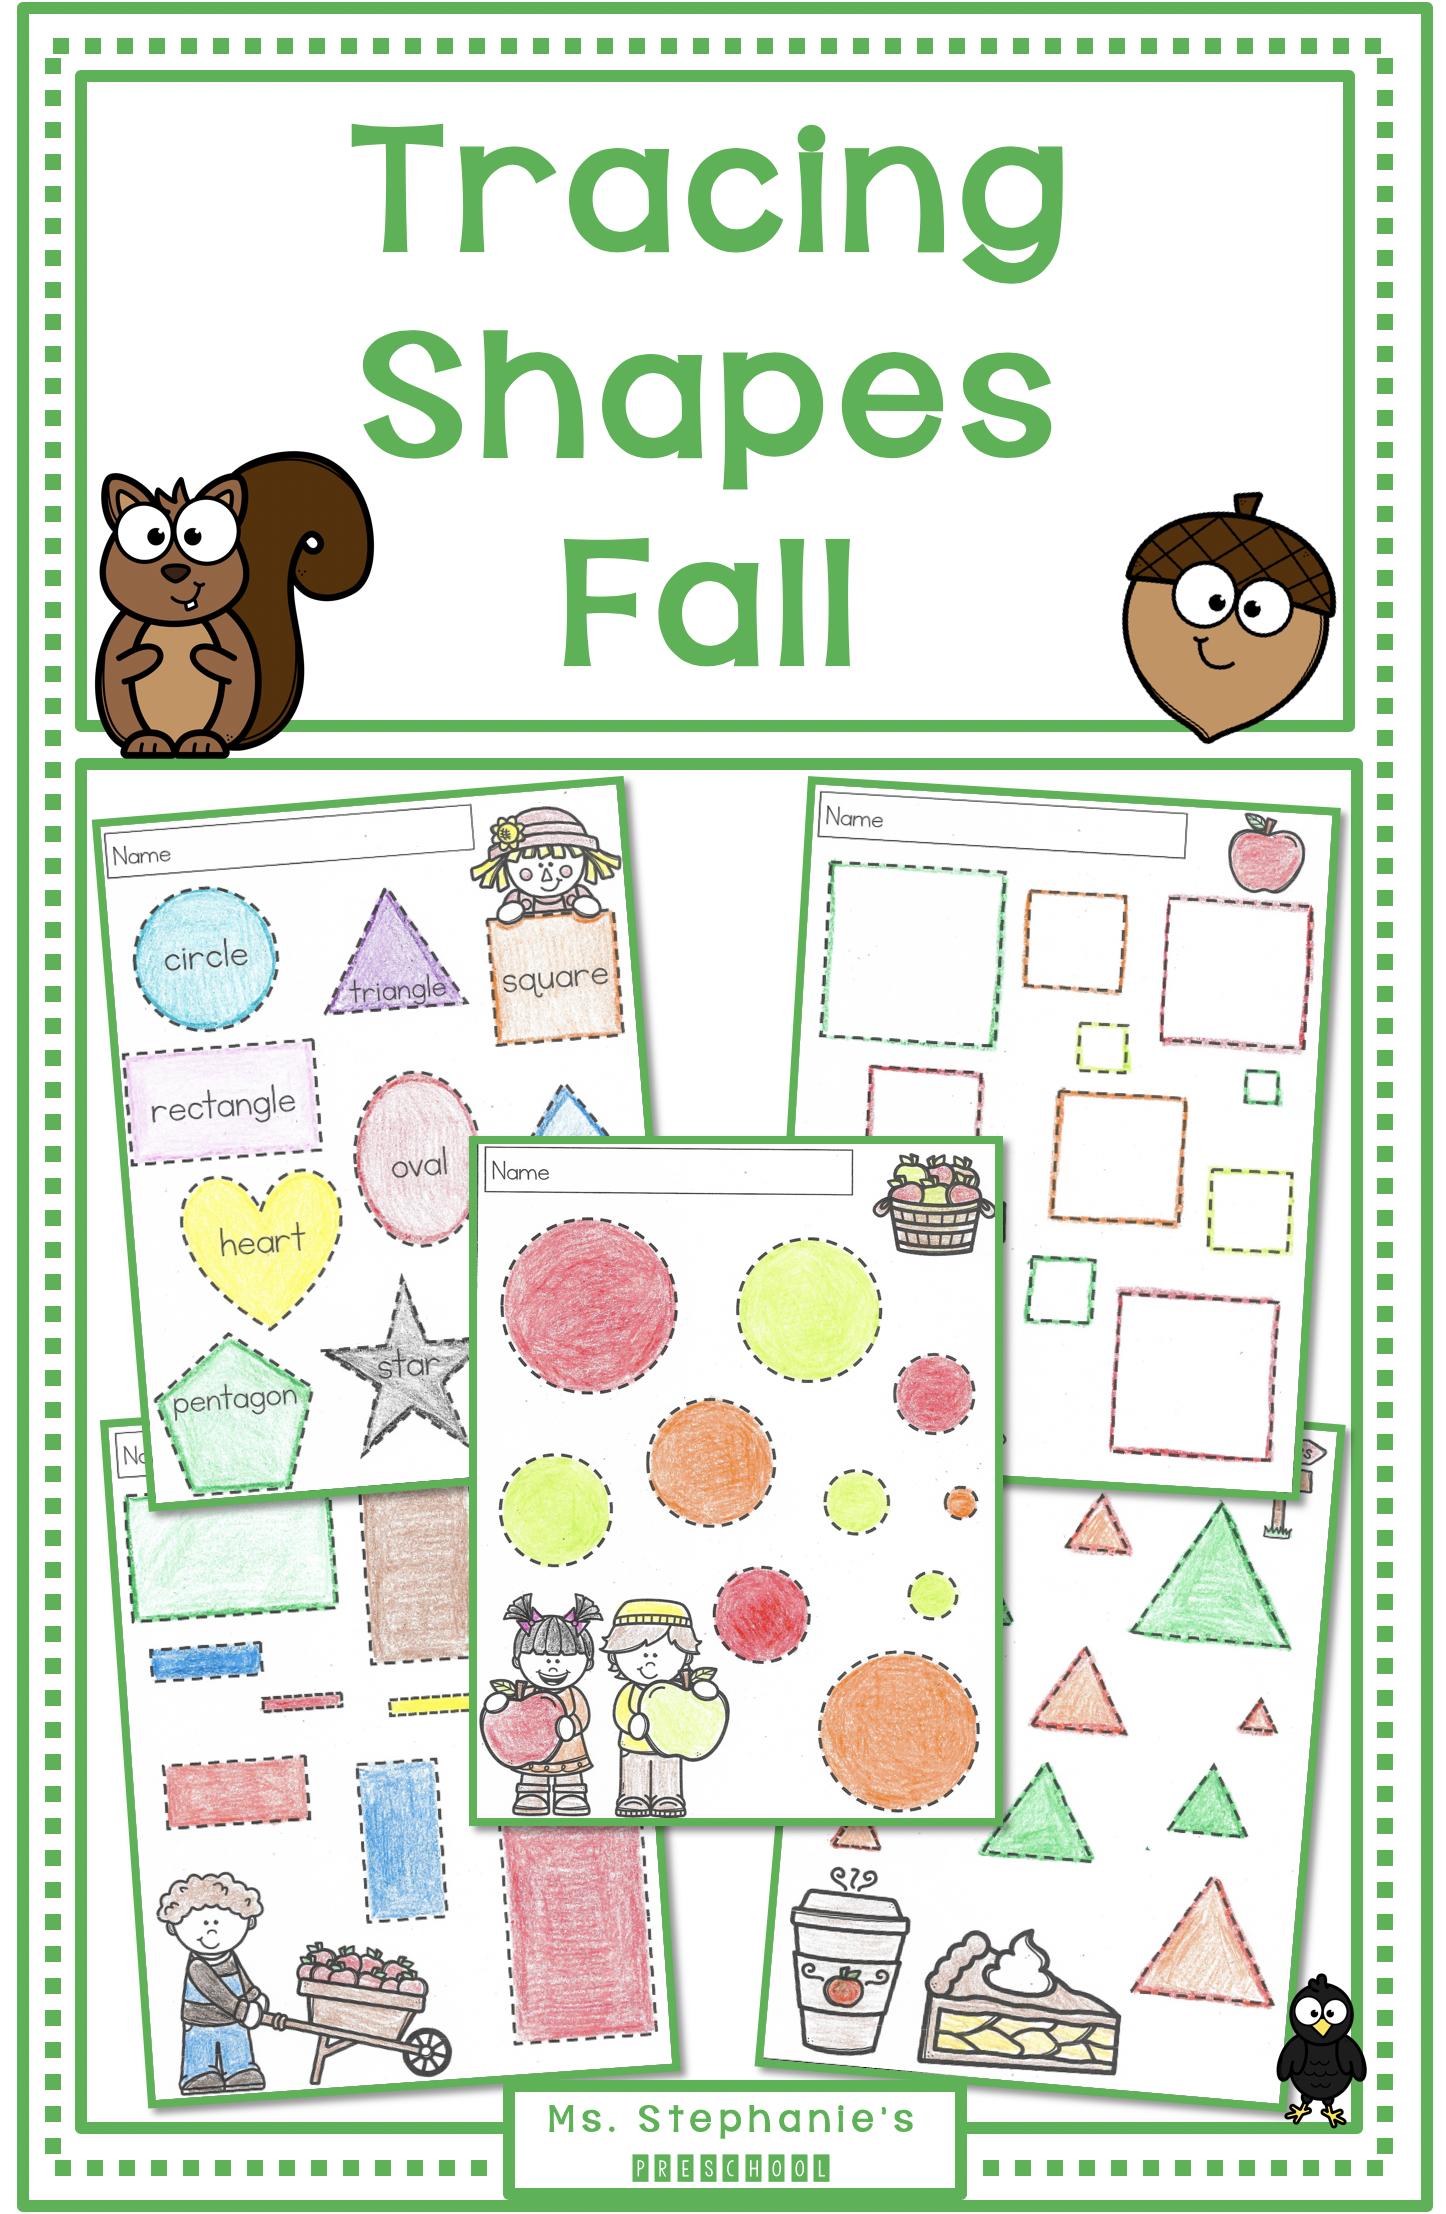 Tracing Shapes Fall Tracing Shapes Fall Worksheets Shapes [ 2214 x 1446 Pixel ]